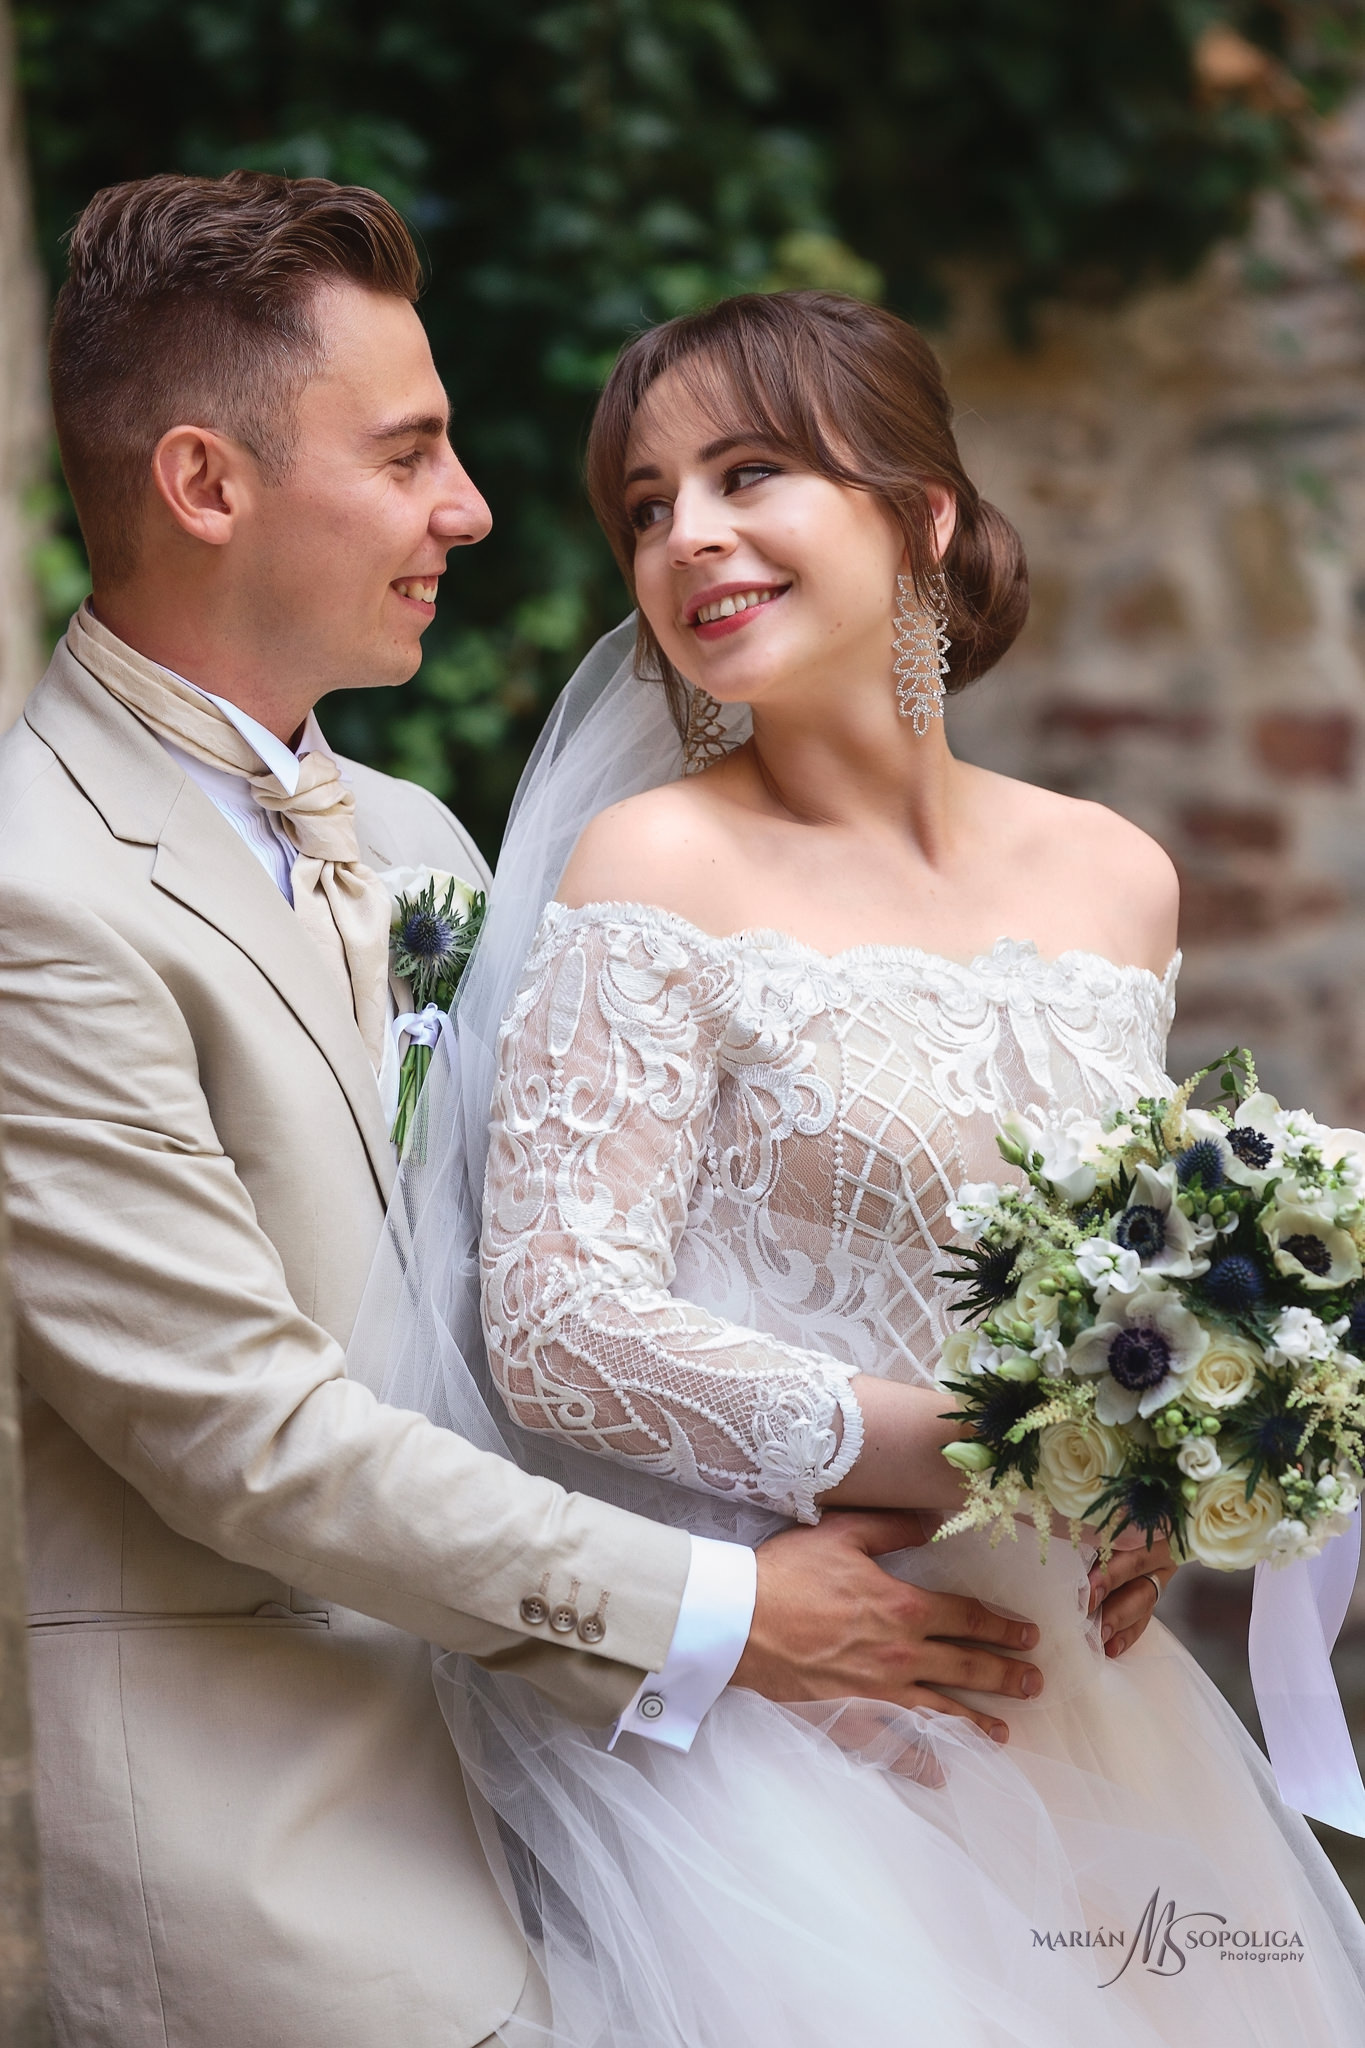 foceni-svateb-na-hrade-bouzov-svatebni-portret-novomanzelu-na-na